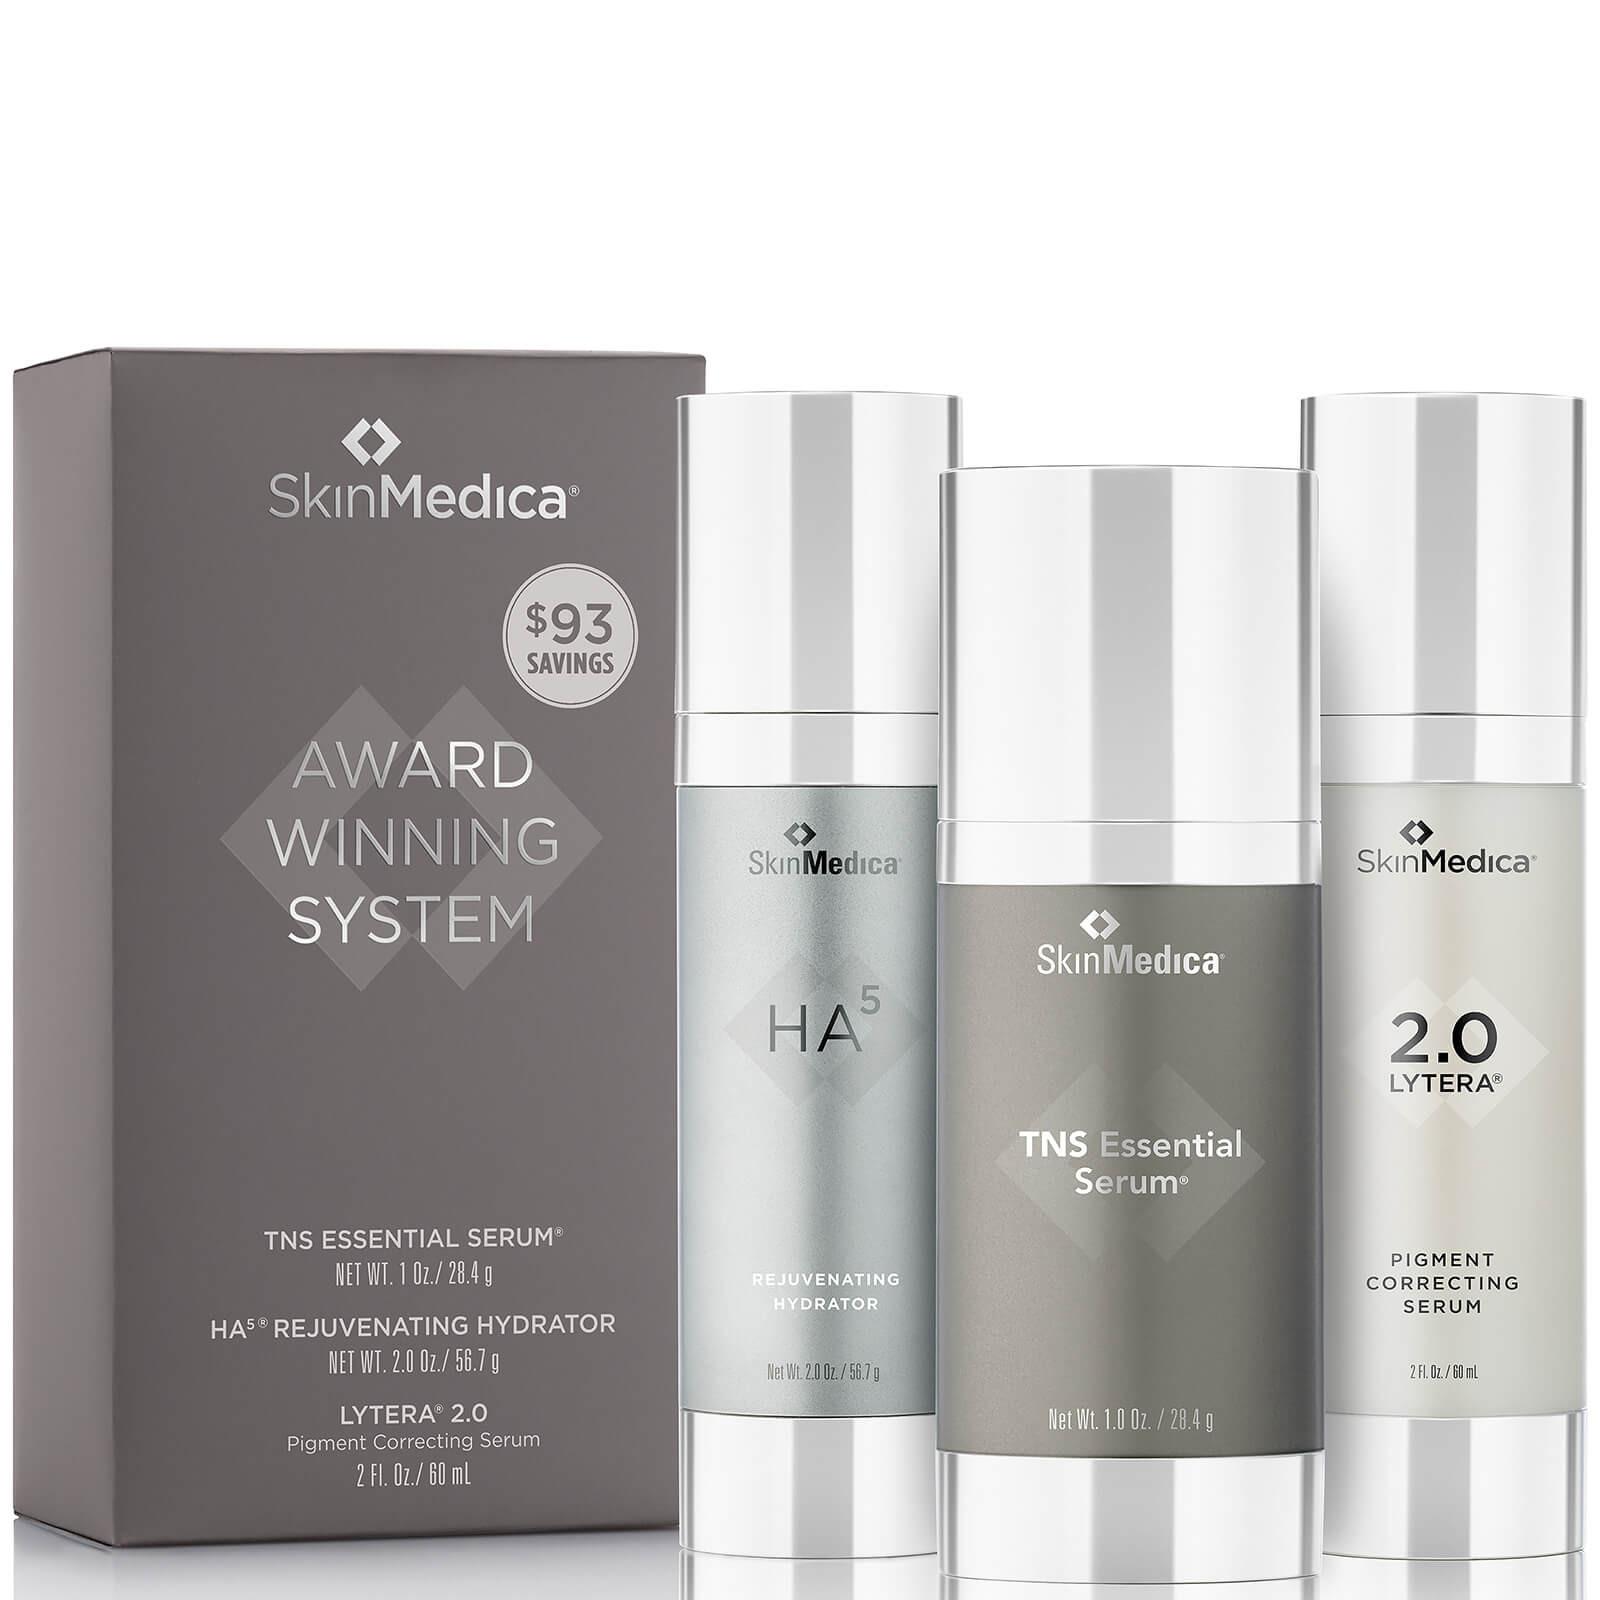 Award Winning System by SkinMedica